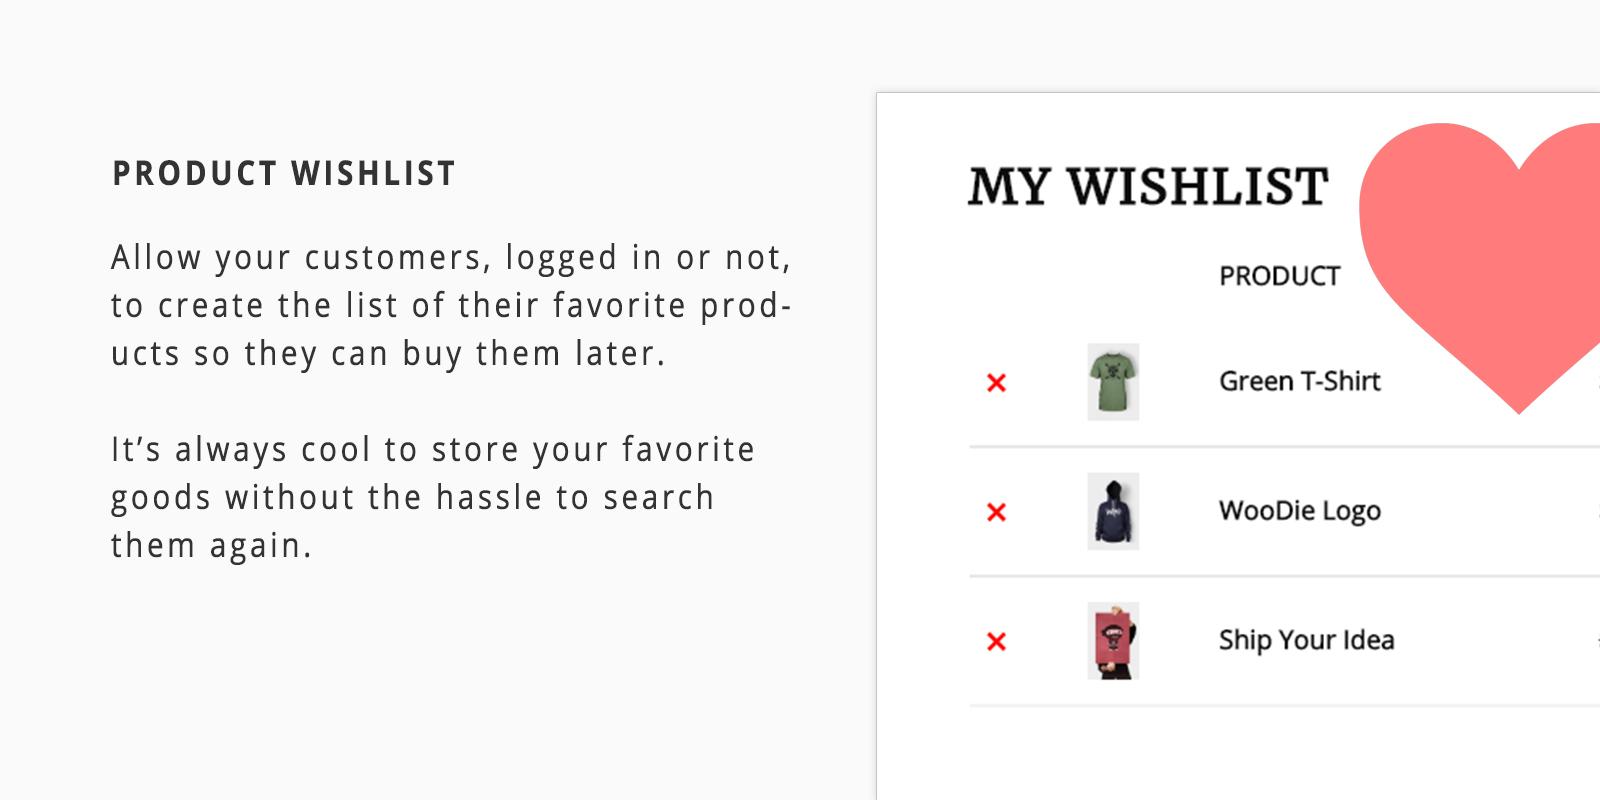 Product Wishlist